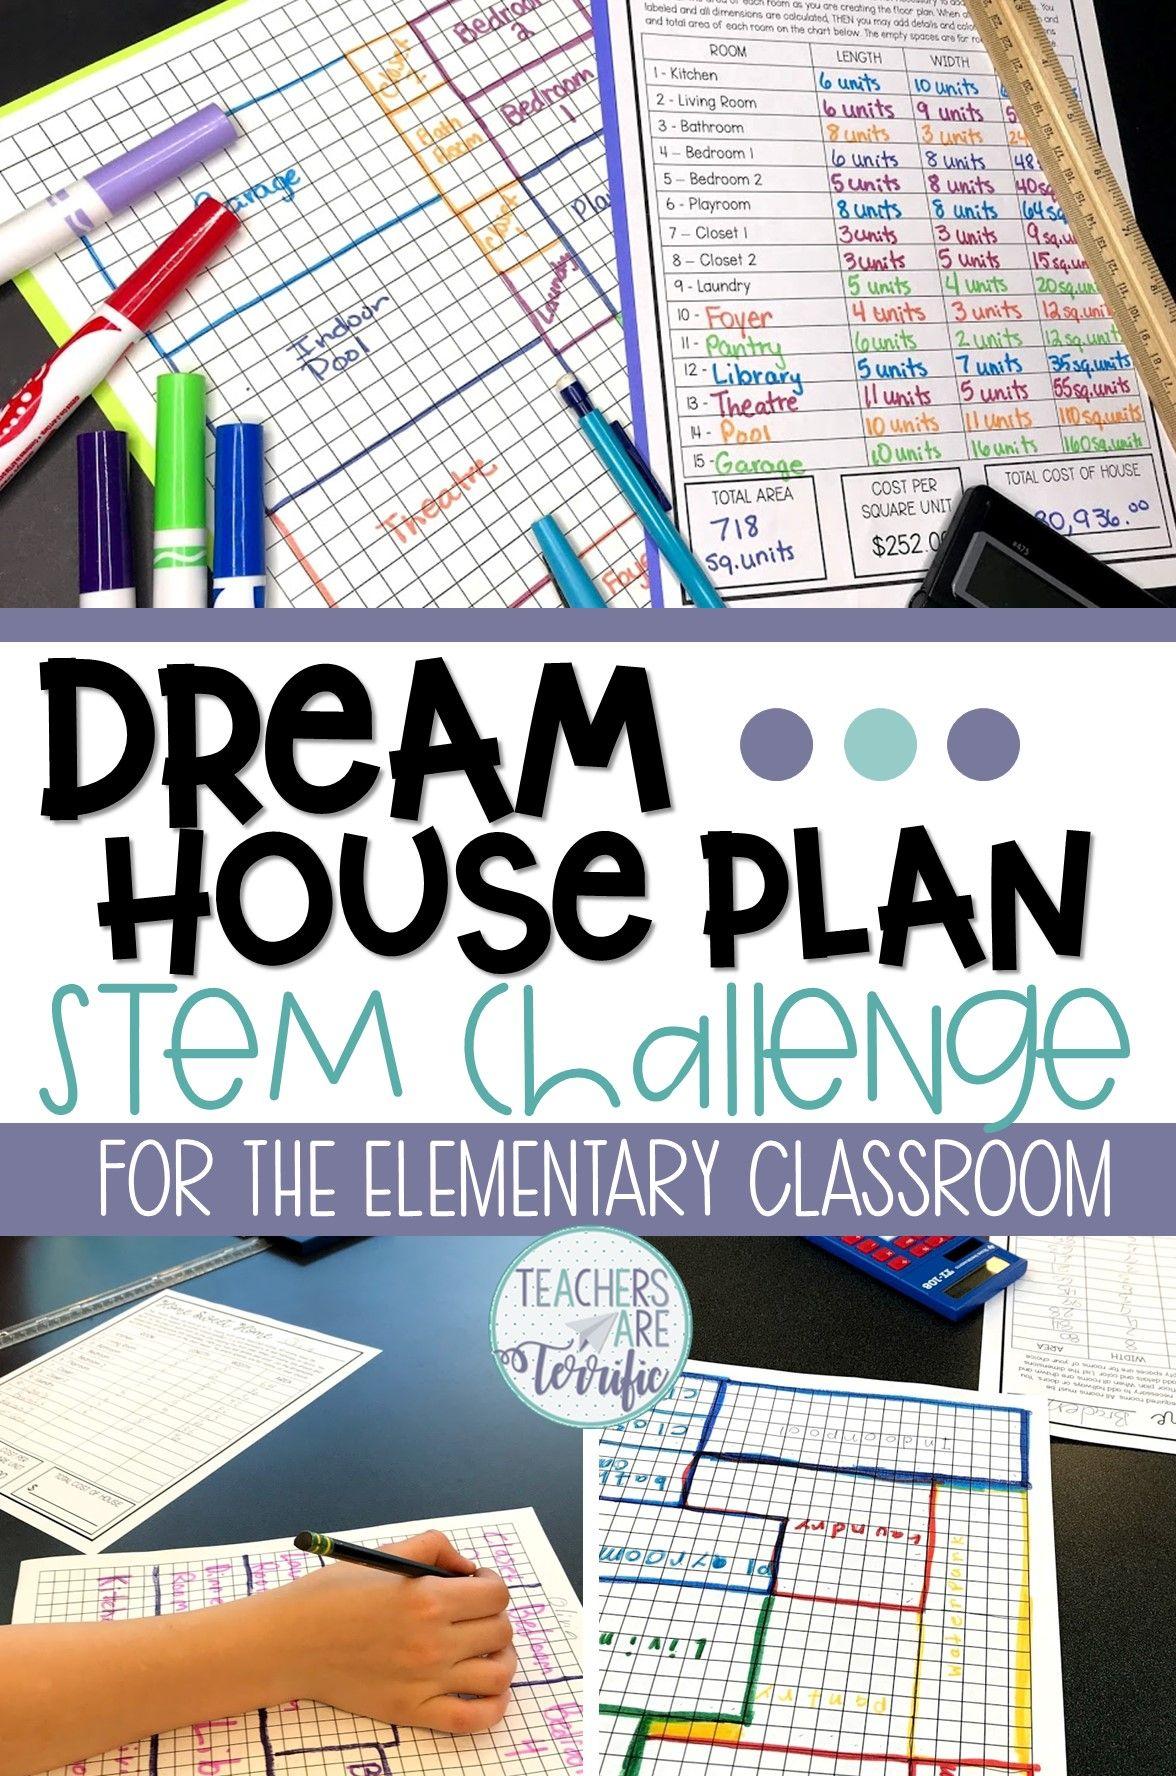 Dream House Floor Plan Quick Stem Challenge Teachers Are Terrific Stem Challenges Math Challenge